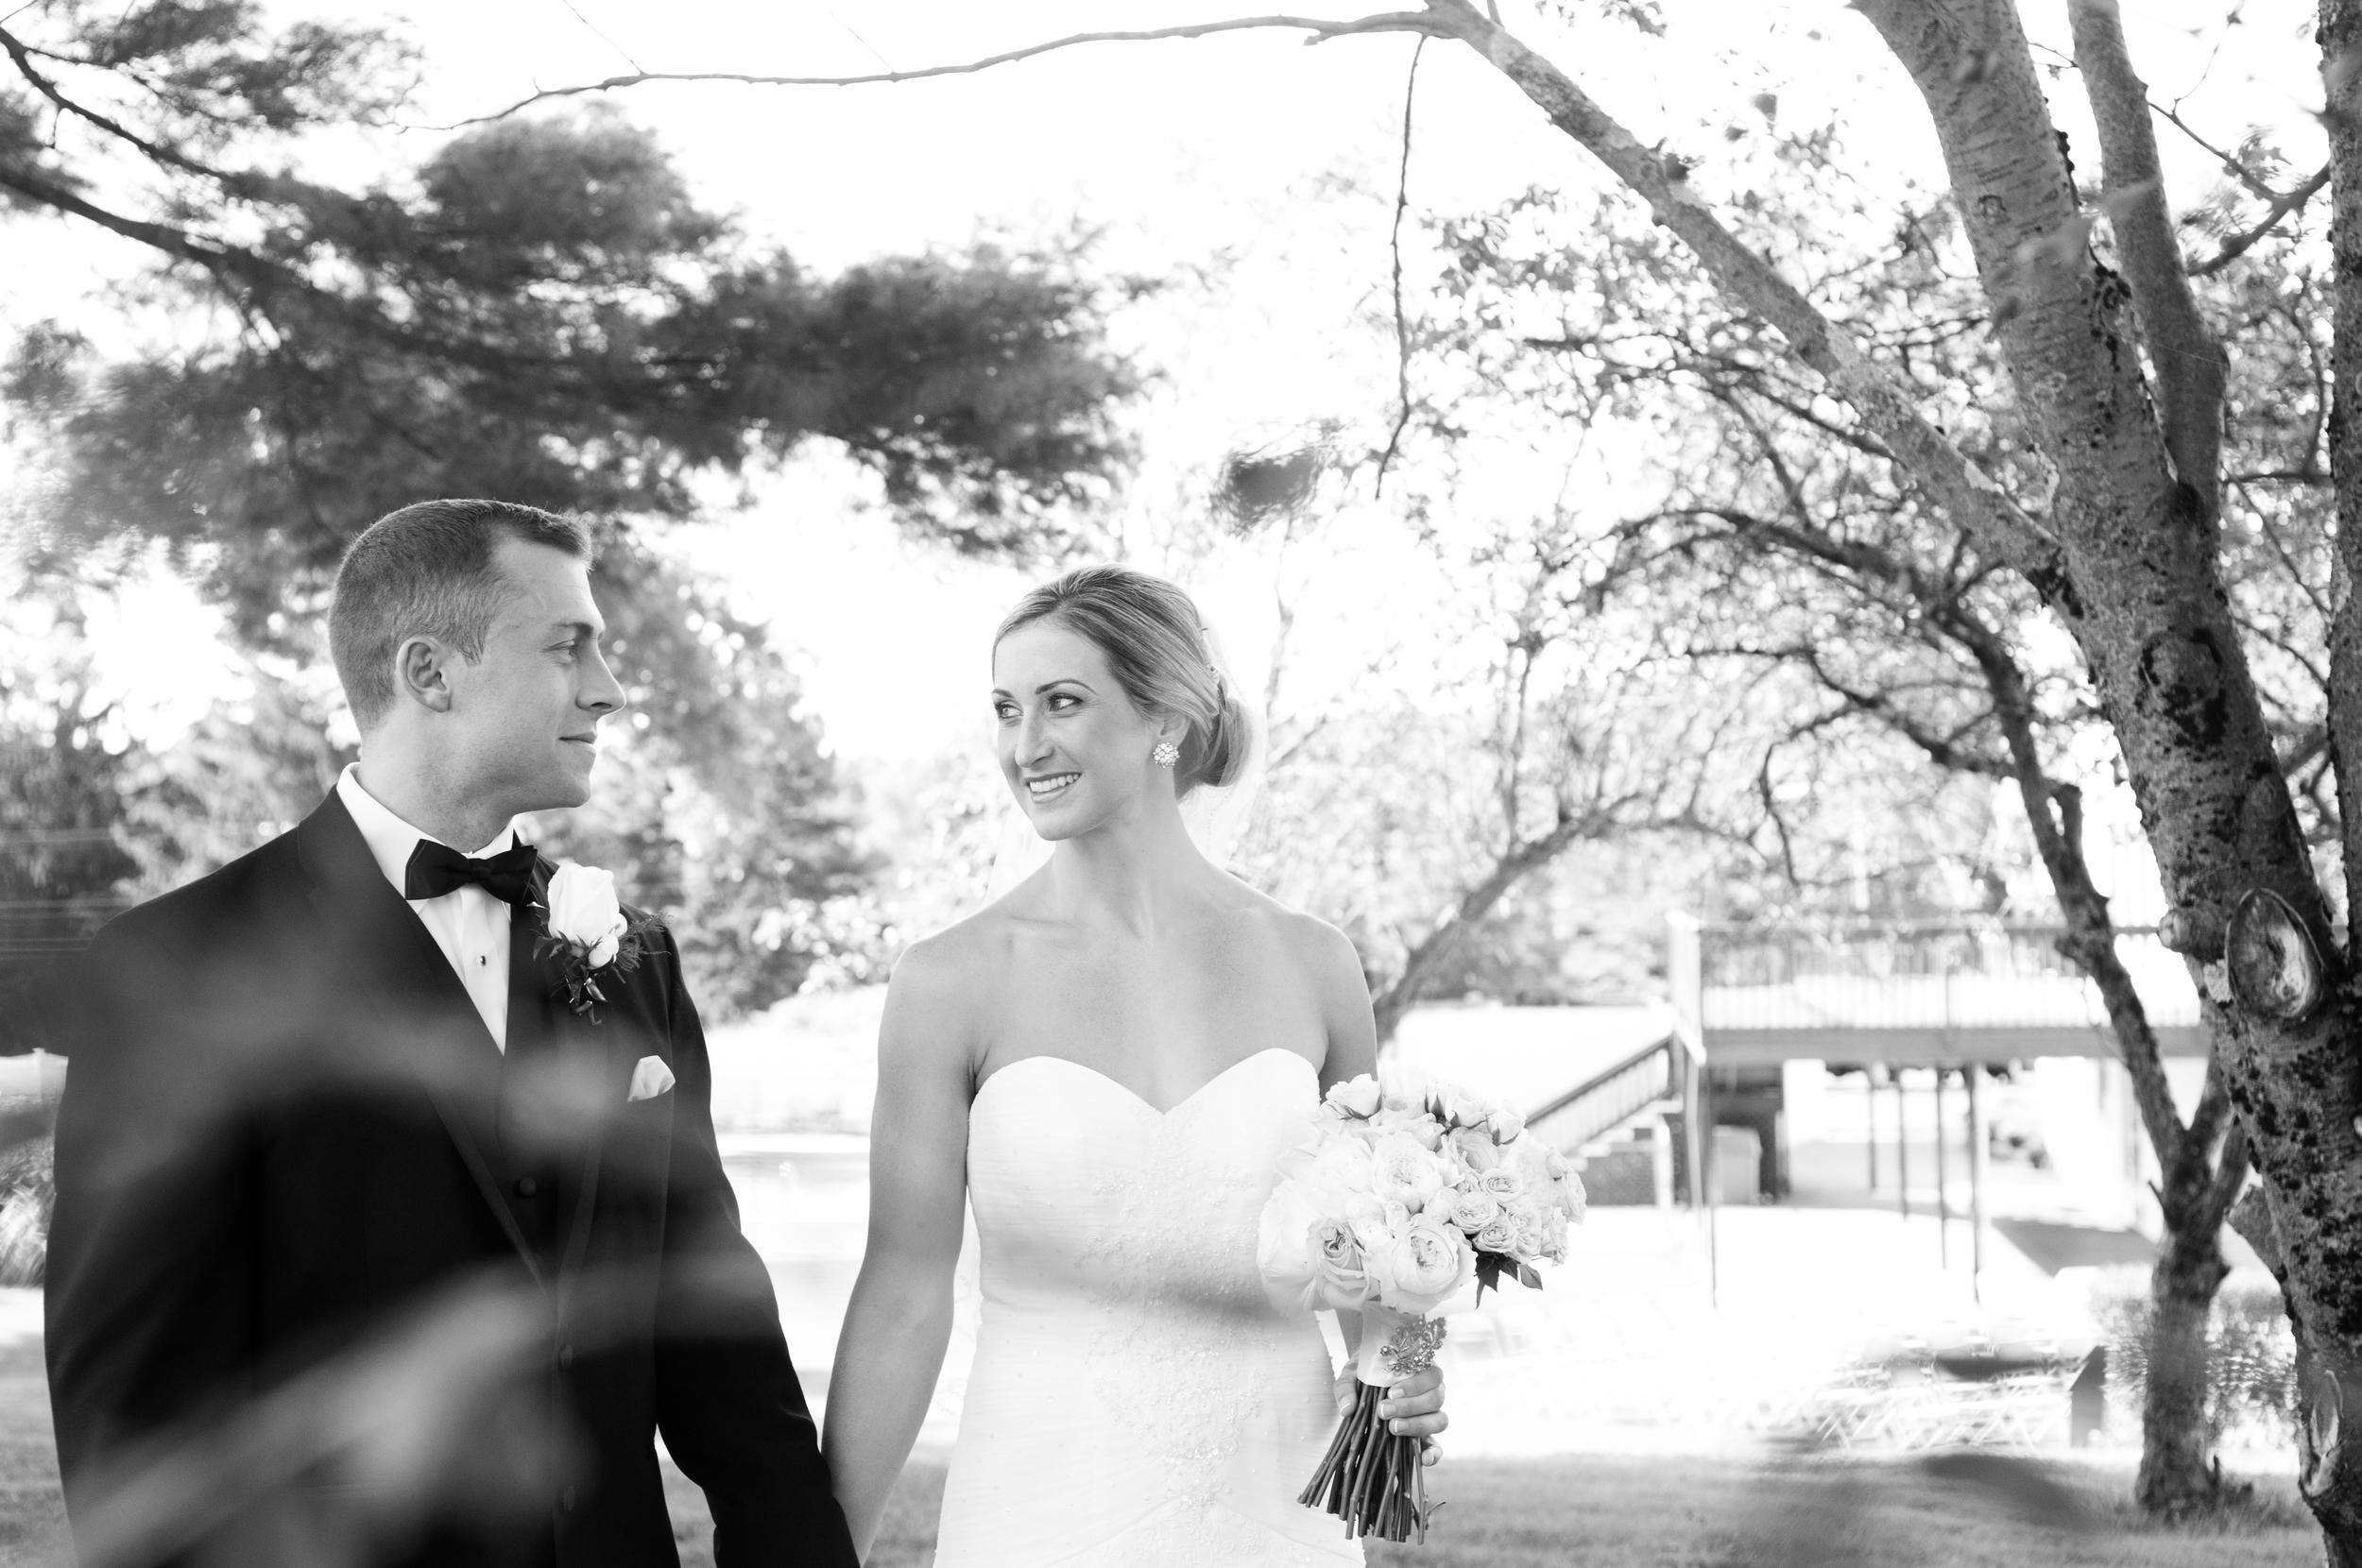 Angela_Chicoski_CT_wedding_photographer_095.jpg